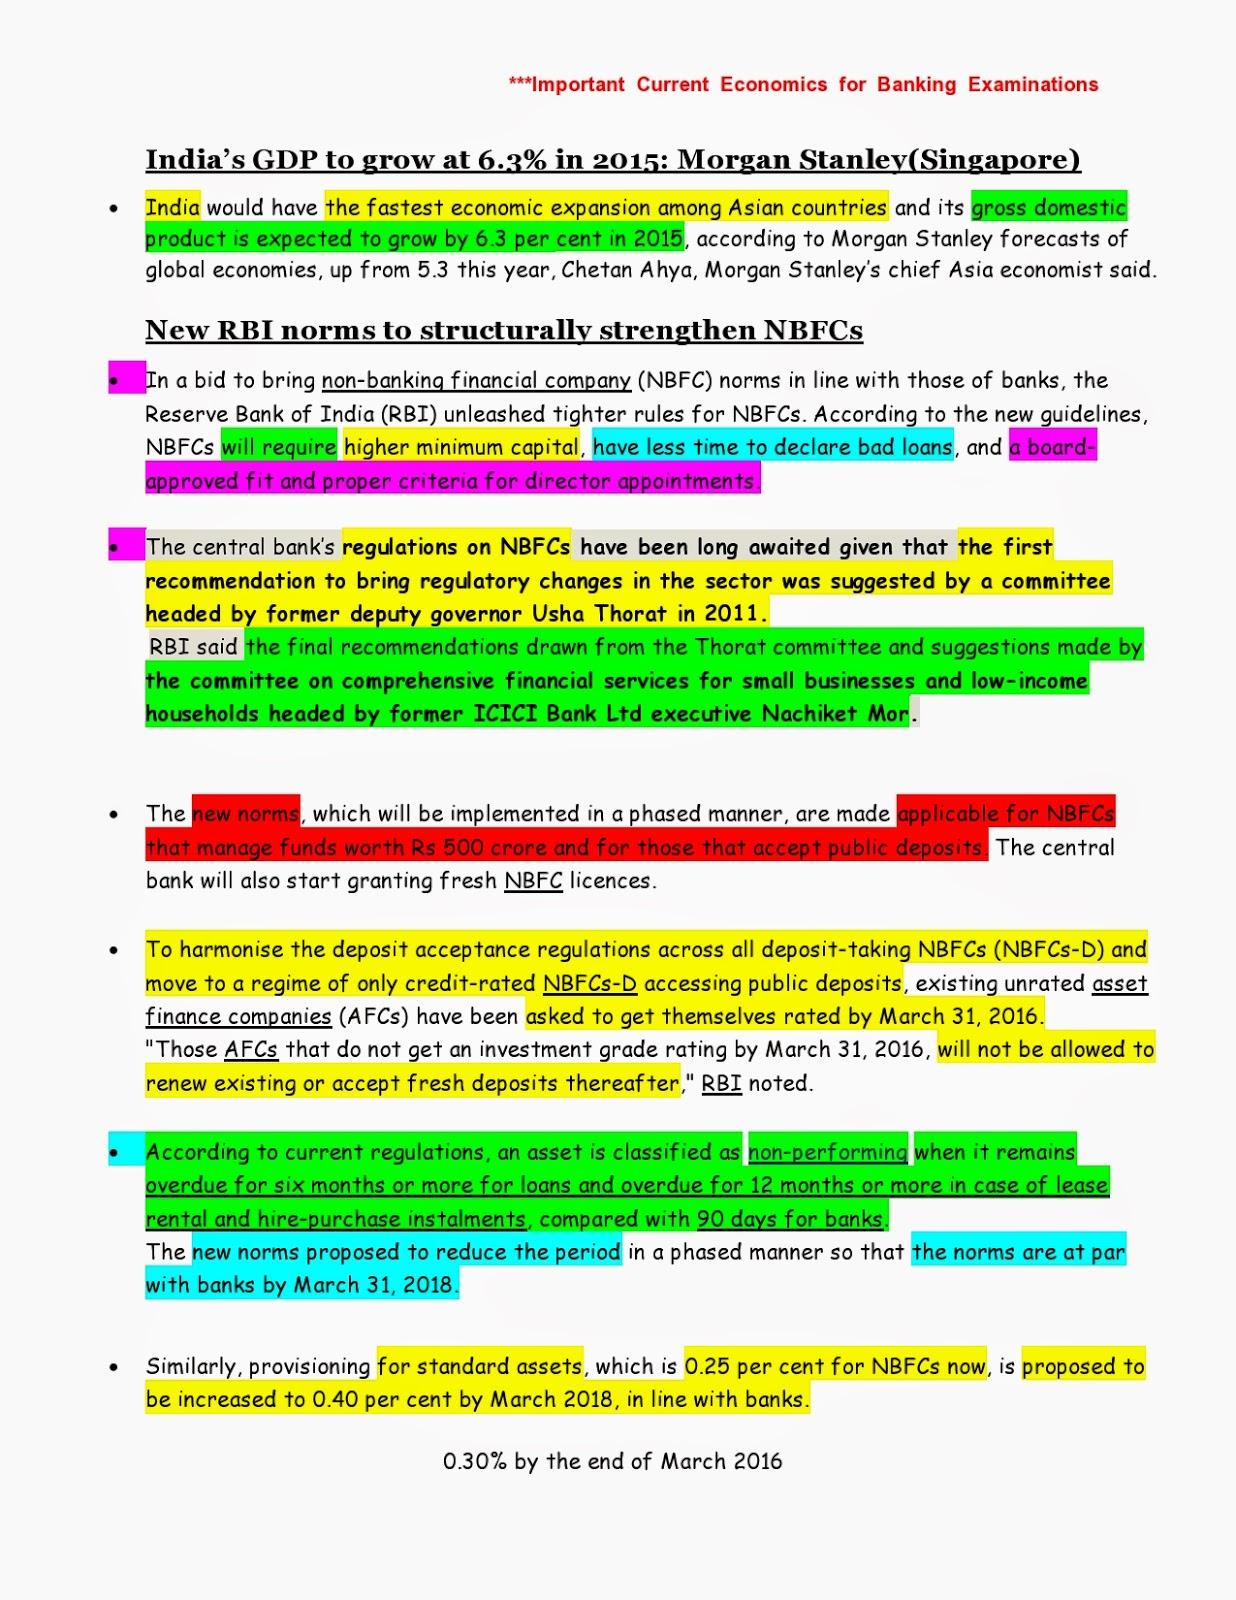 UPSC Daily Dose: 2014